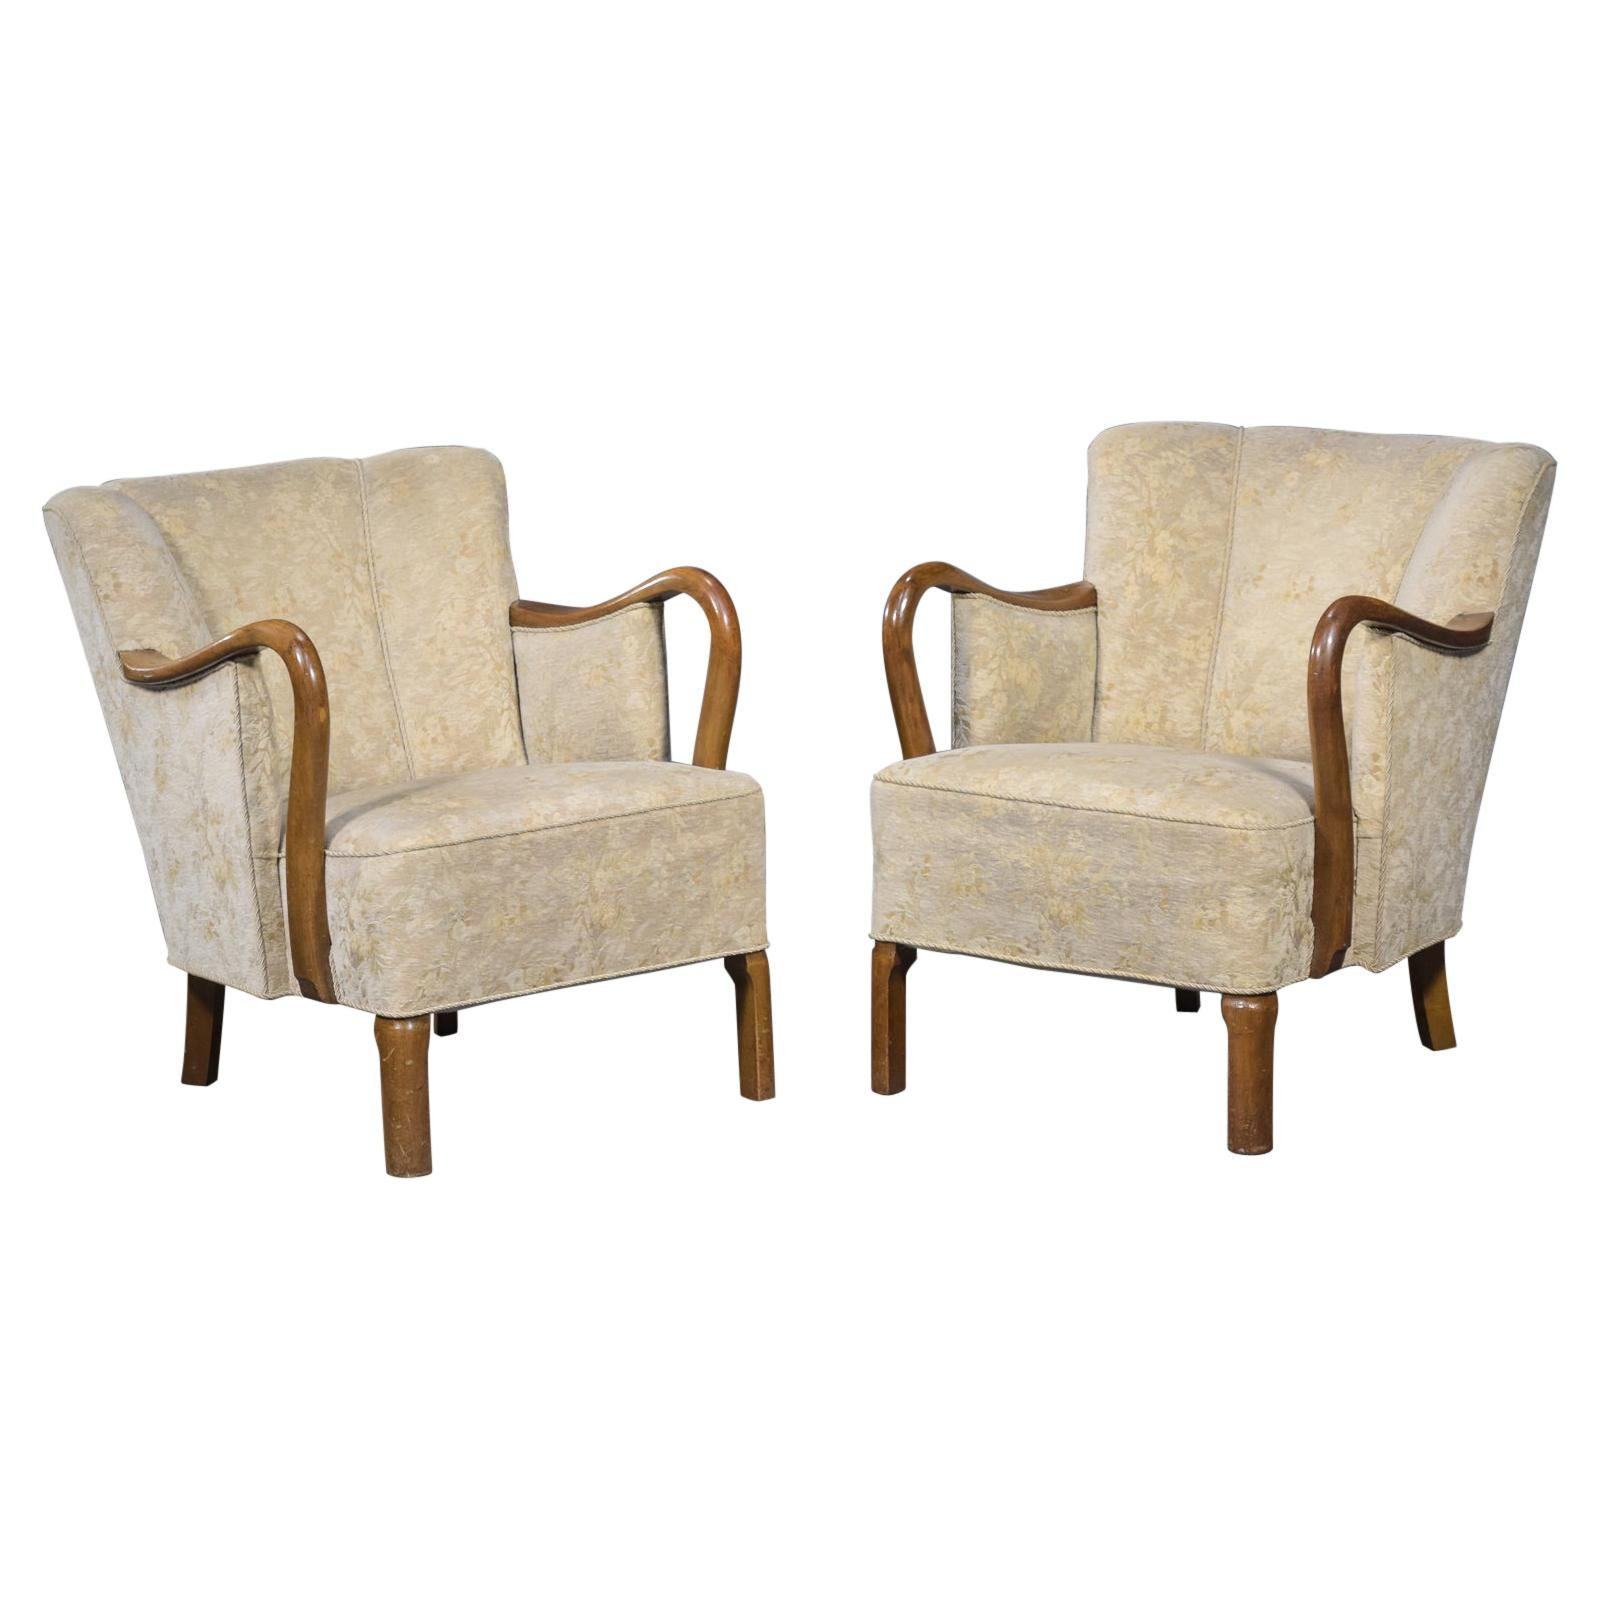 Pair of 1940's Viggo Boesen Attributed Danish Lounge Chairs in Oak by Slagelse